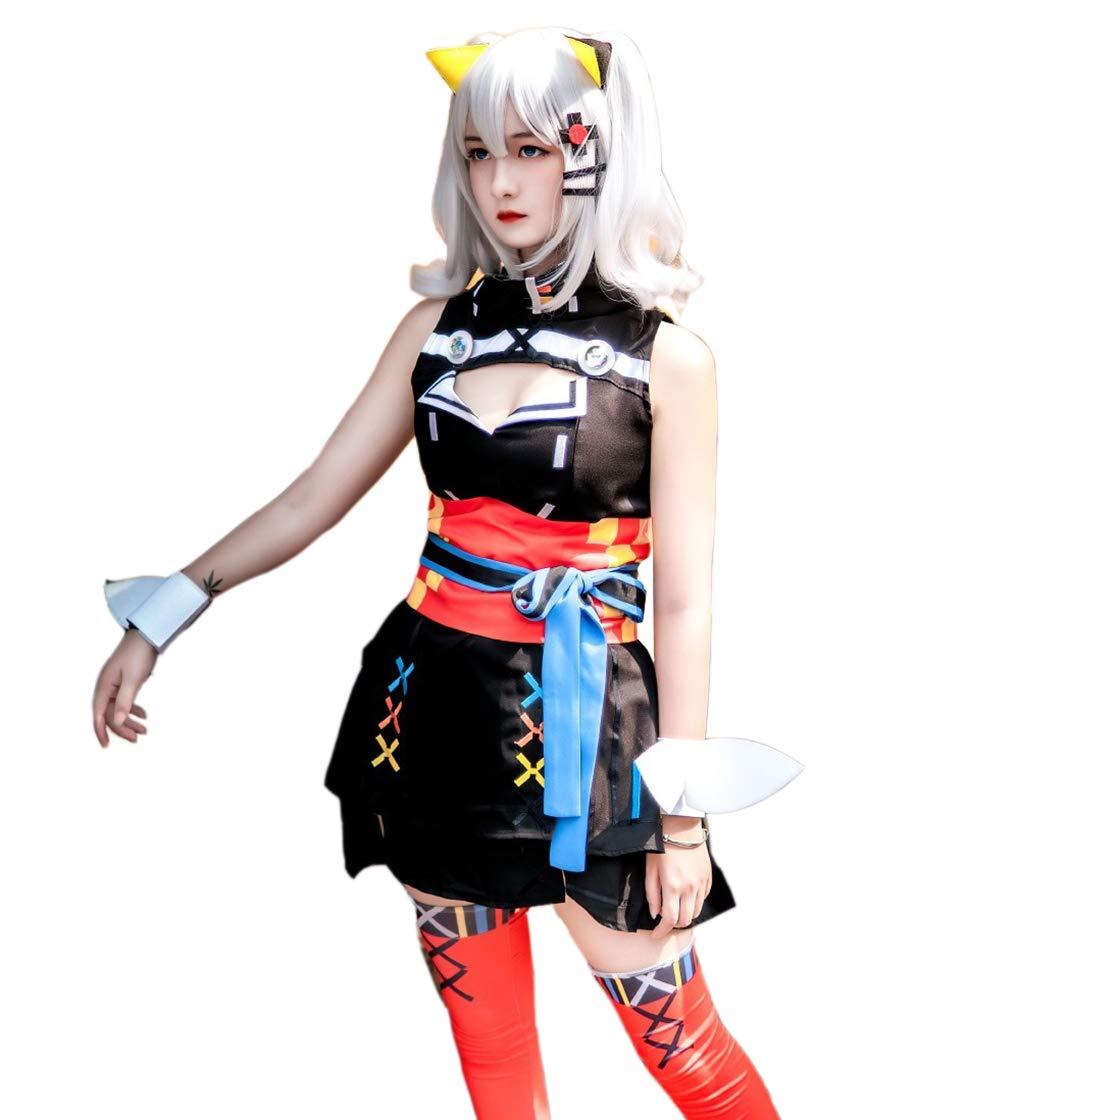 Cnstone コスプレ衣装 輝夜月ちゃん コスプレウイッグ追加できる コスチューム ハロウィン 仮装 (女性L, 衣装+ウイッグ) B07NWGGH8F 衣装 女性XL 女性XL|衣装